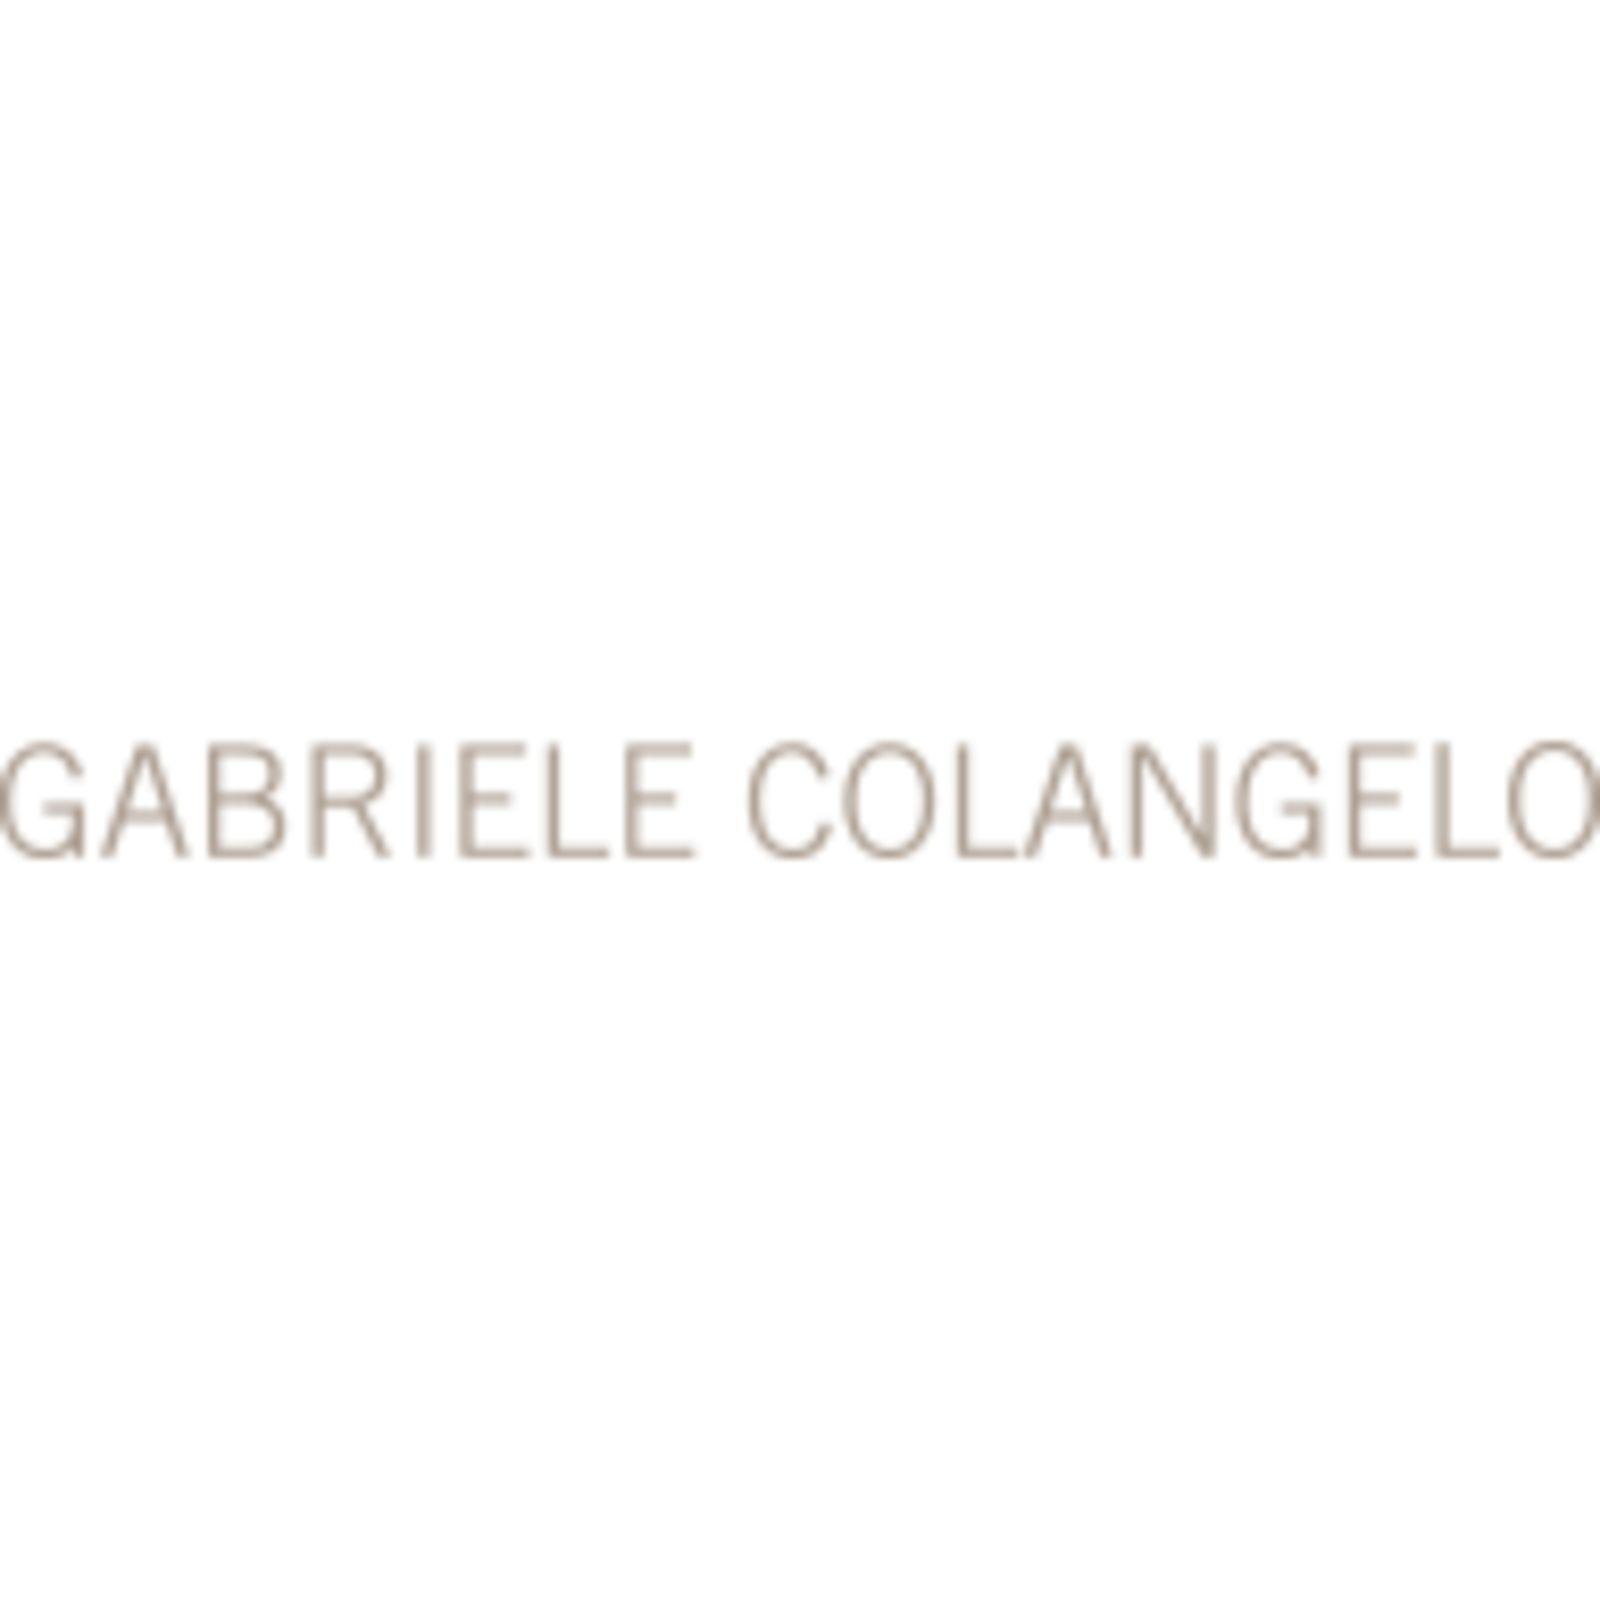 GABRIELE COLANGELO